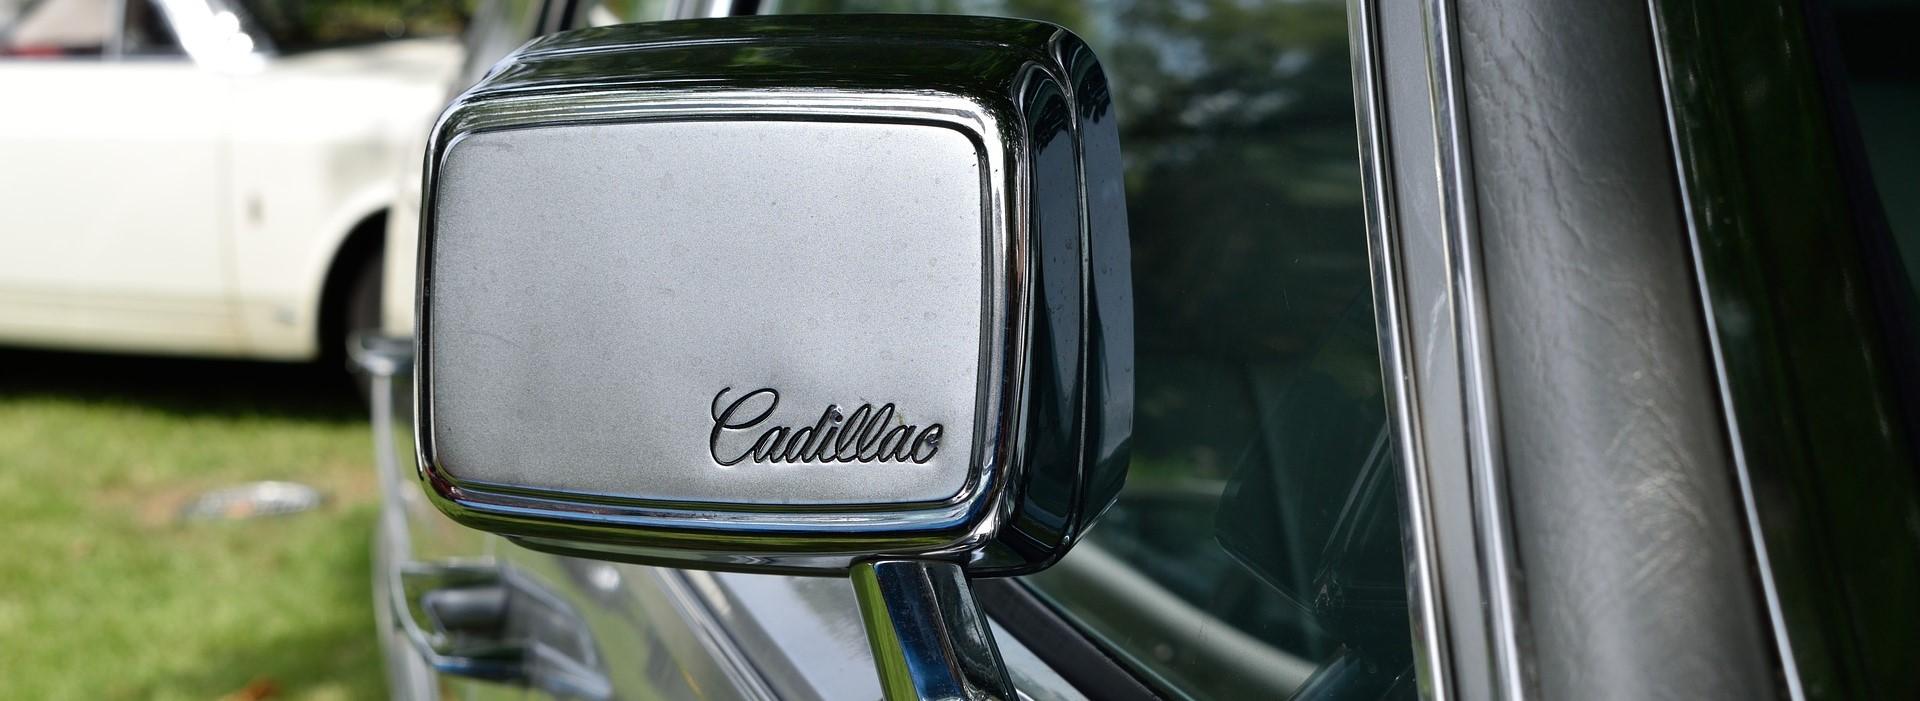 Oldtimer Cardillac in Timonium, Maryland | Breast Cancer Car Donations